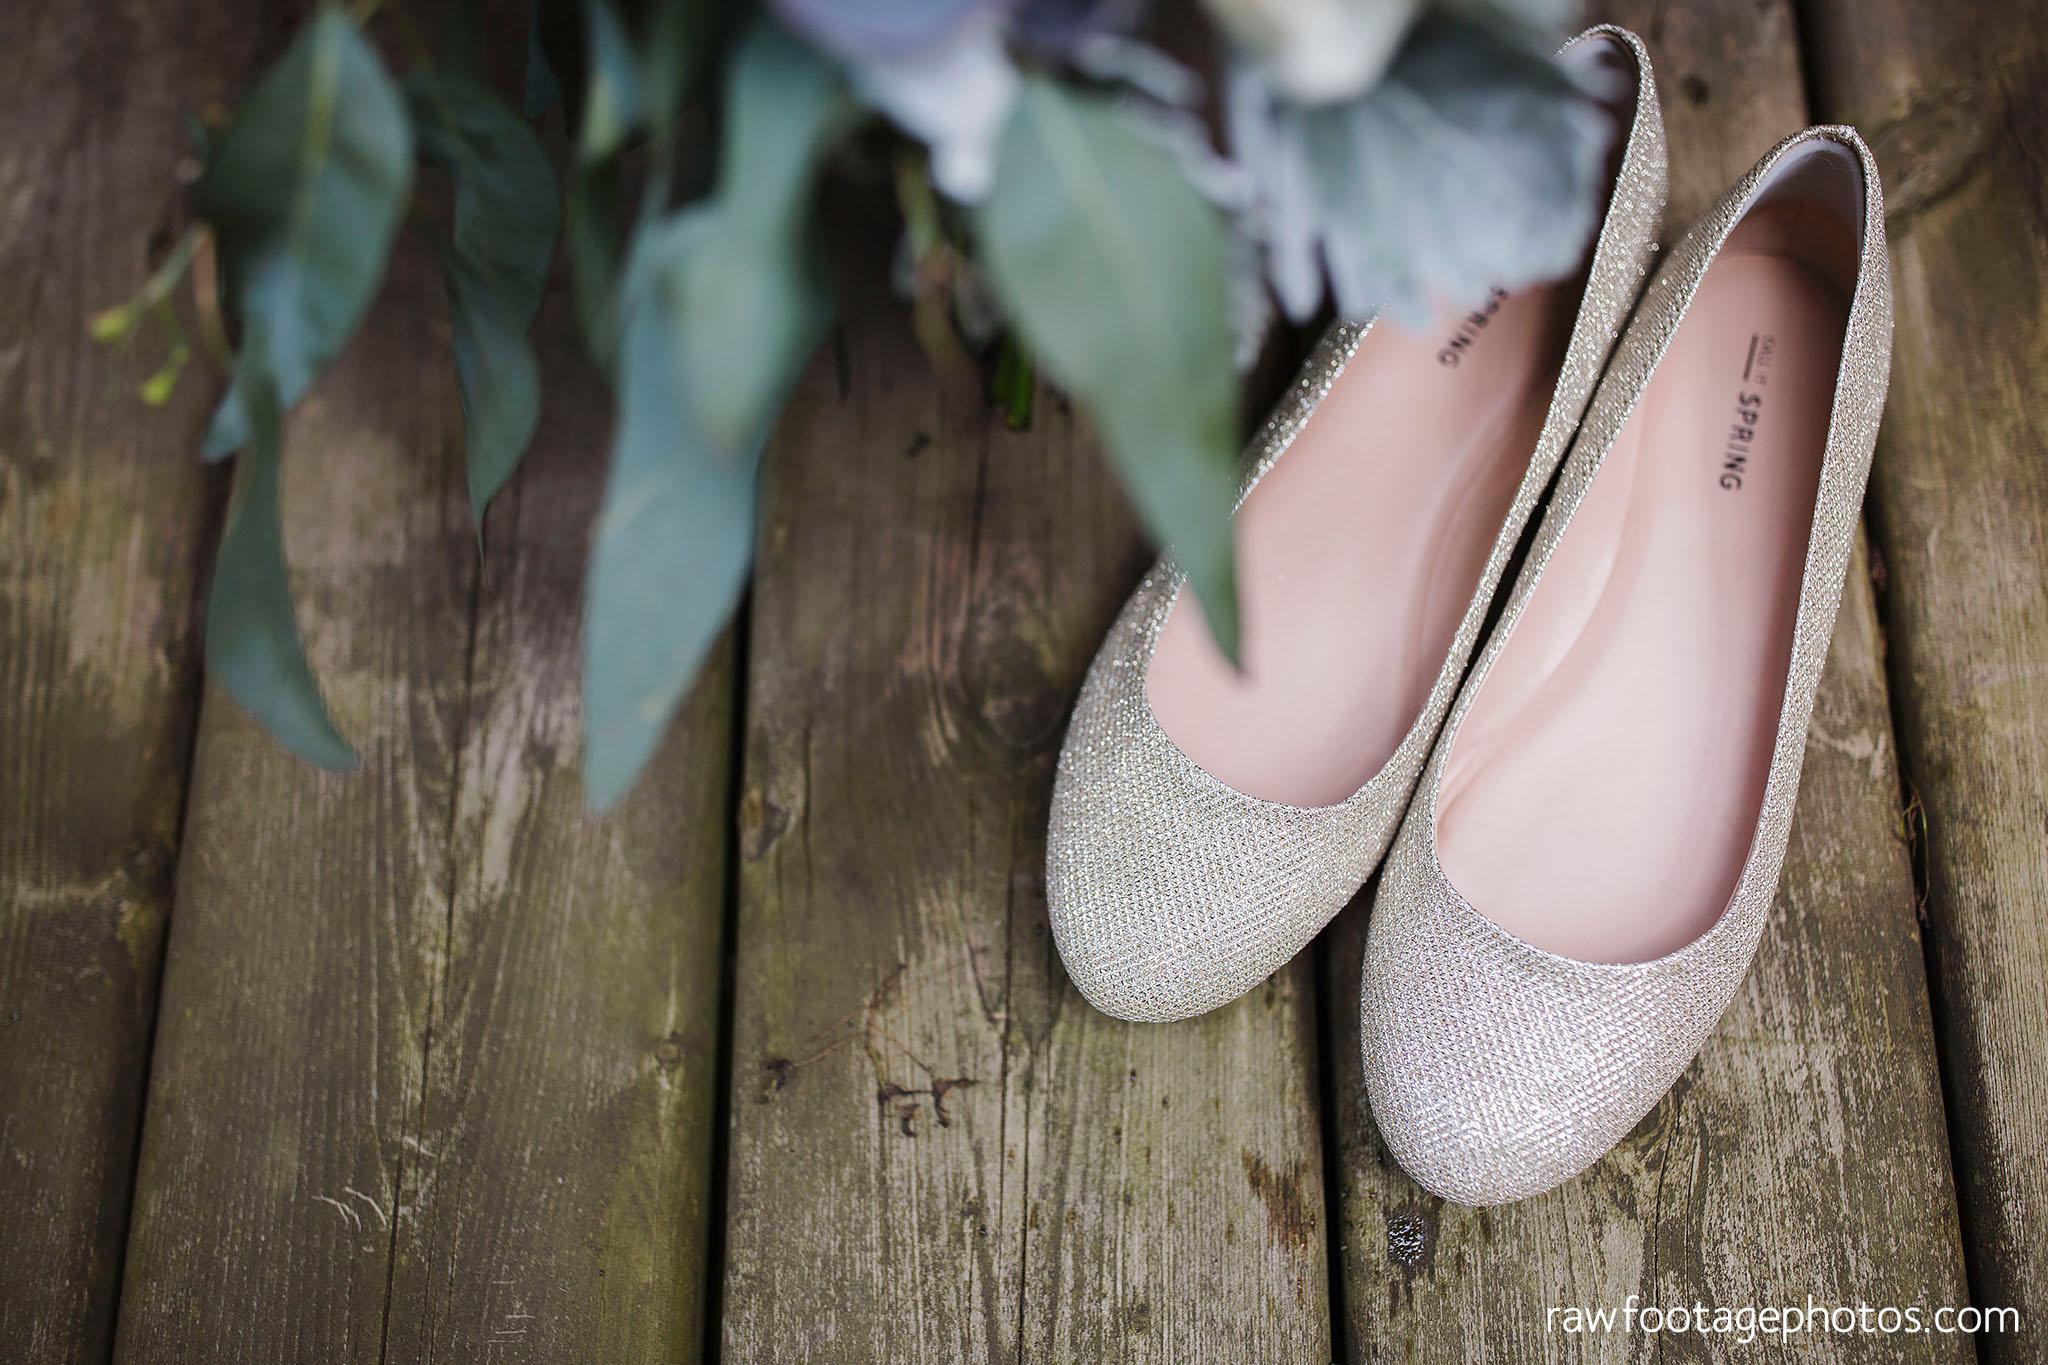 london_ontario_wedding_photographer-century_wedding_barn-raw_footage_photography-diy_wedding016.jpg